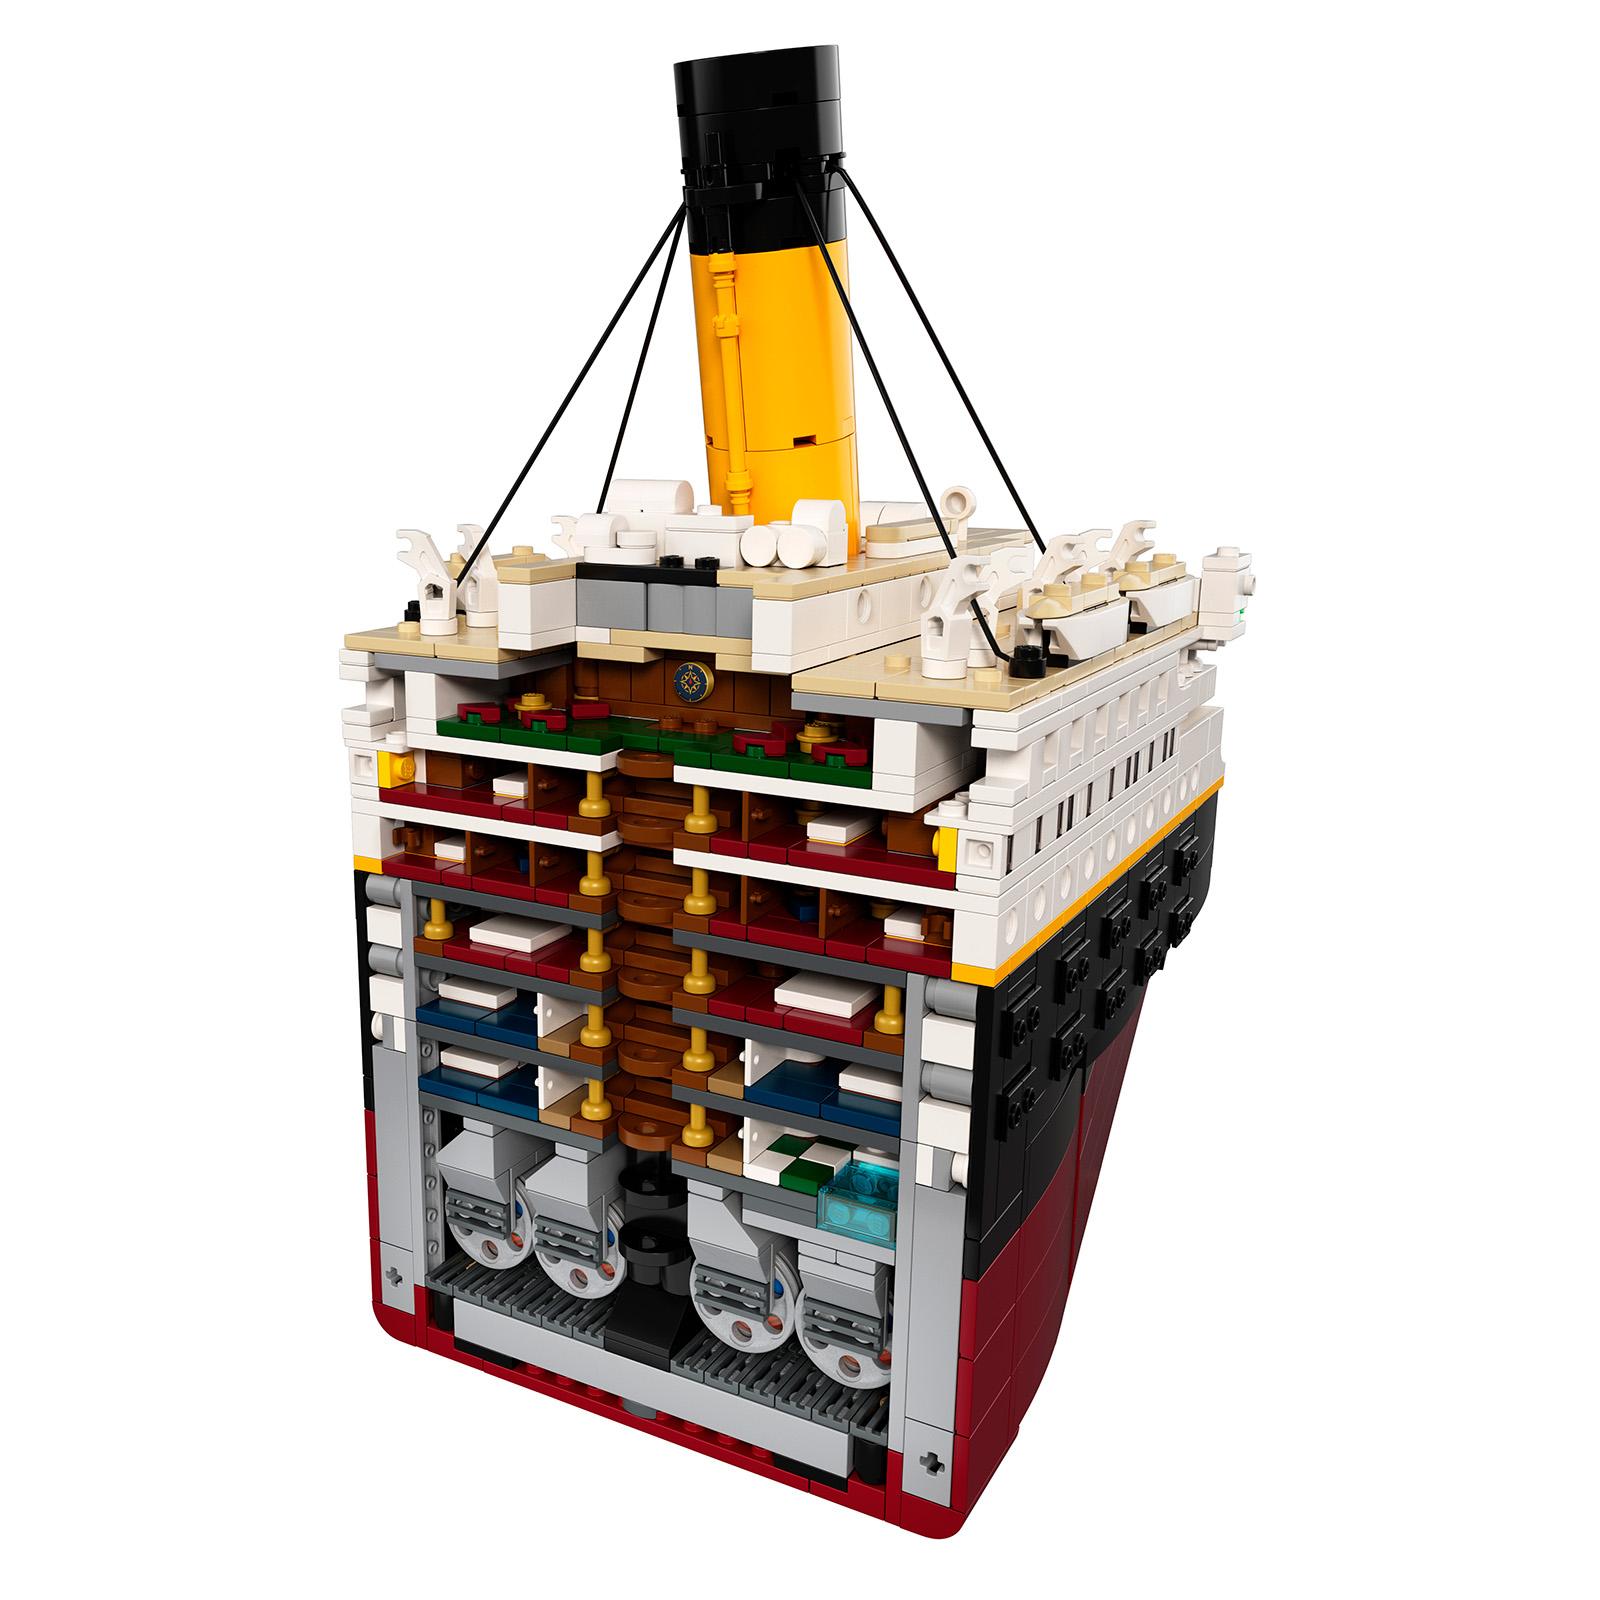 LEGO : Ze topik =) - Page 8 Lego-adults-welcome-10294-titanic-2021_8